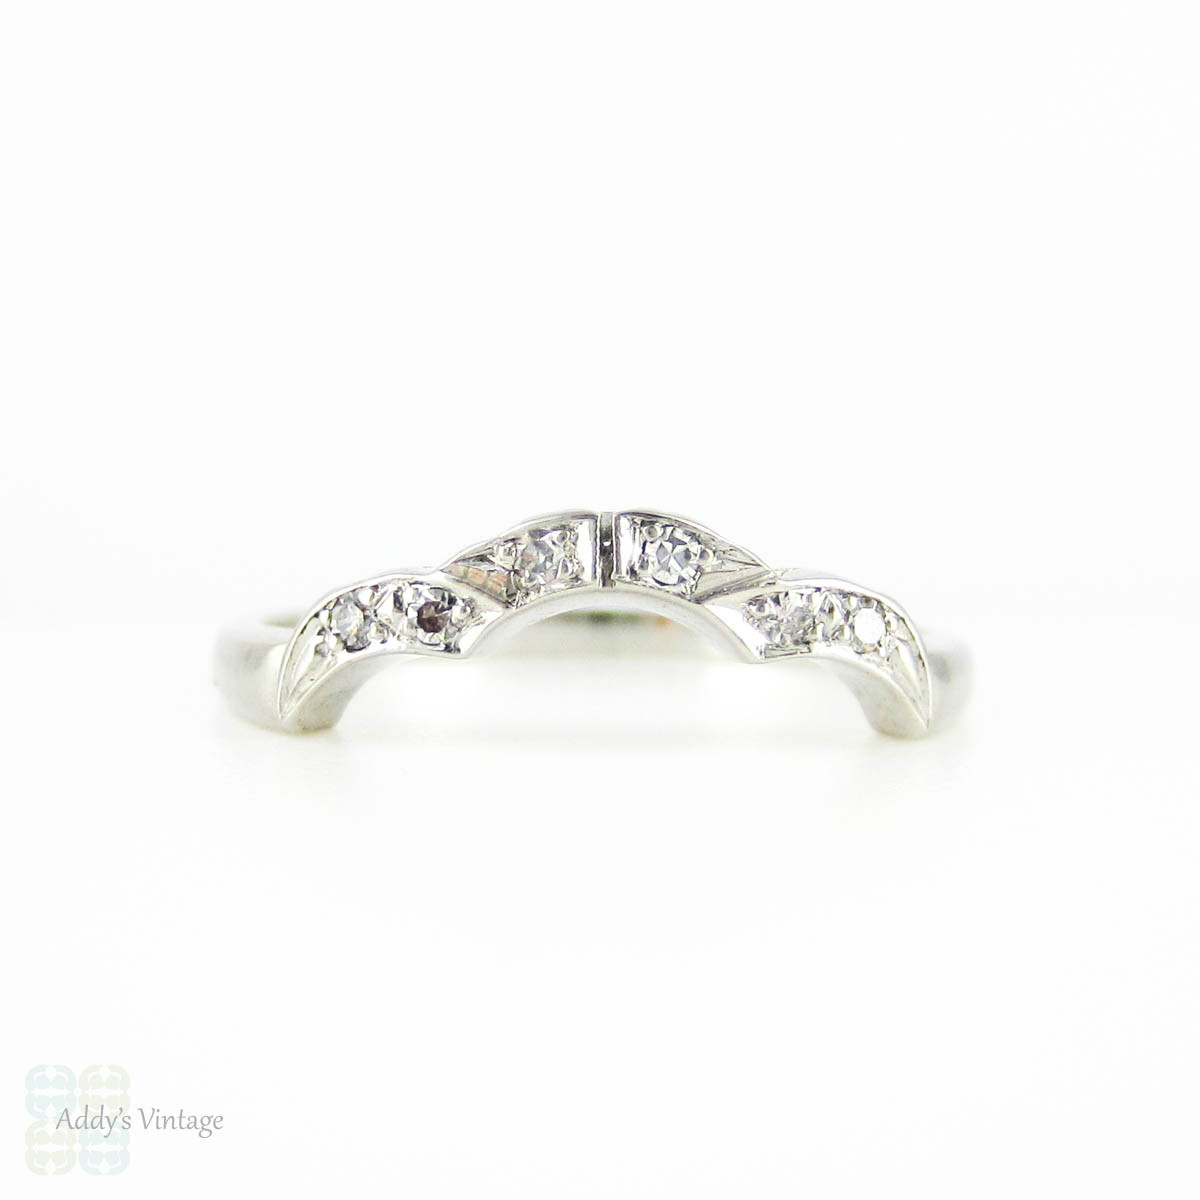 Art Deco Curved Wedding Ring Platinum Diamond Shaped Wedding Band